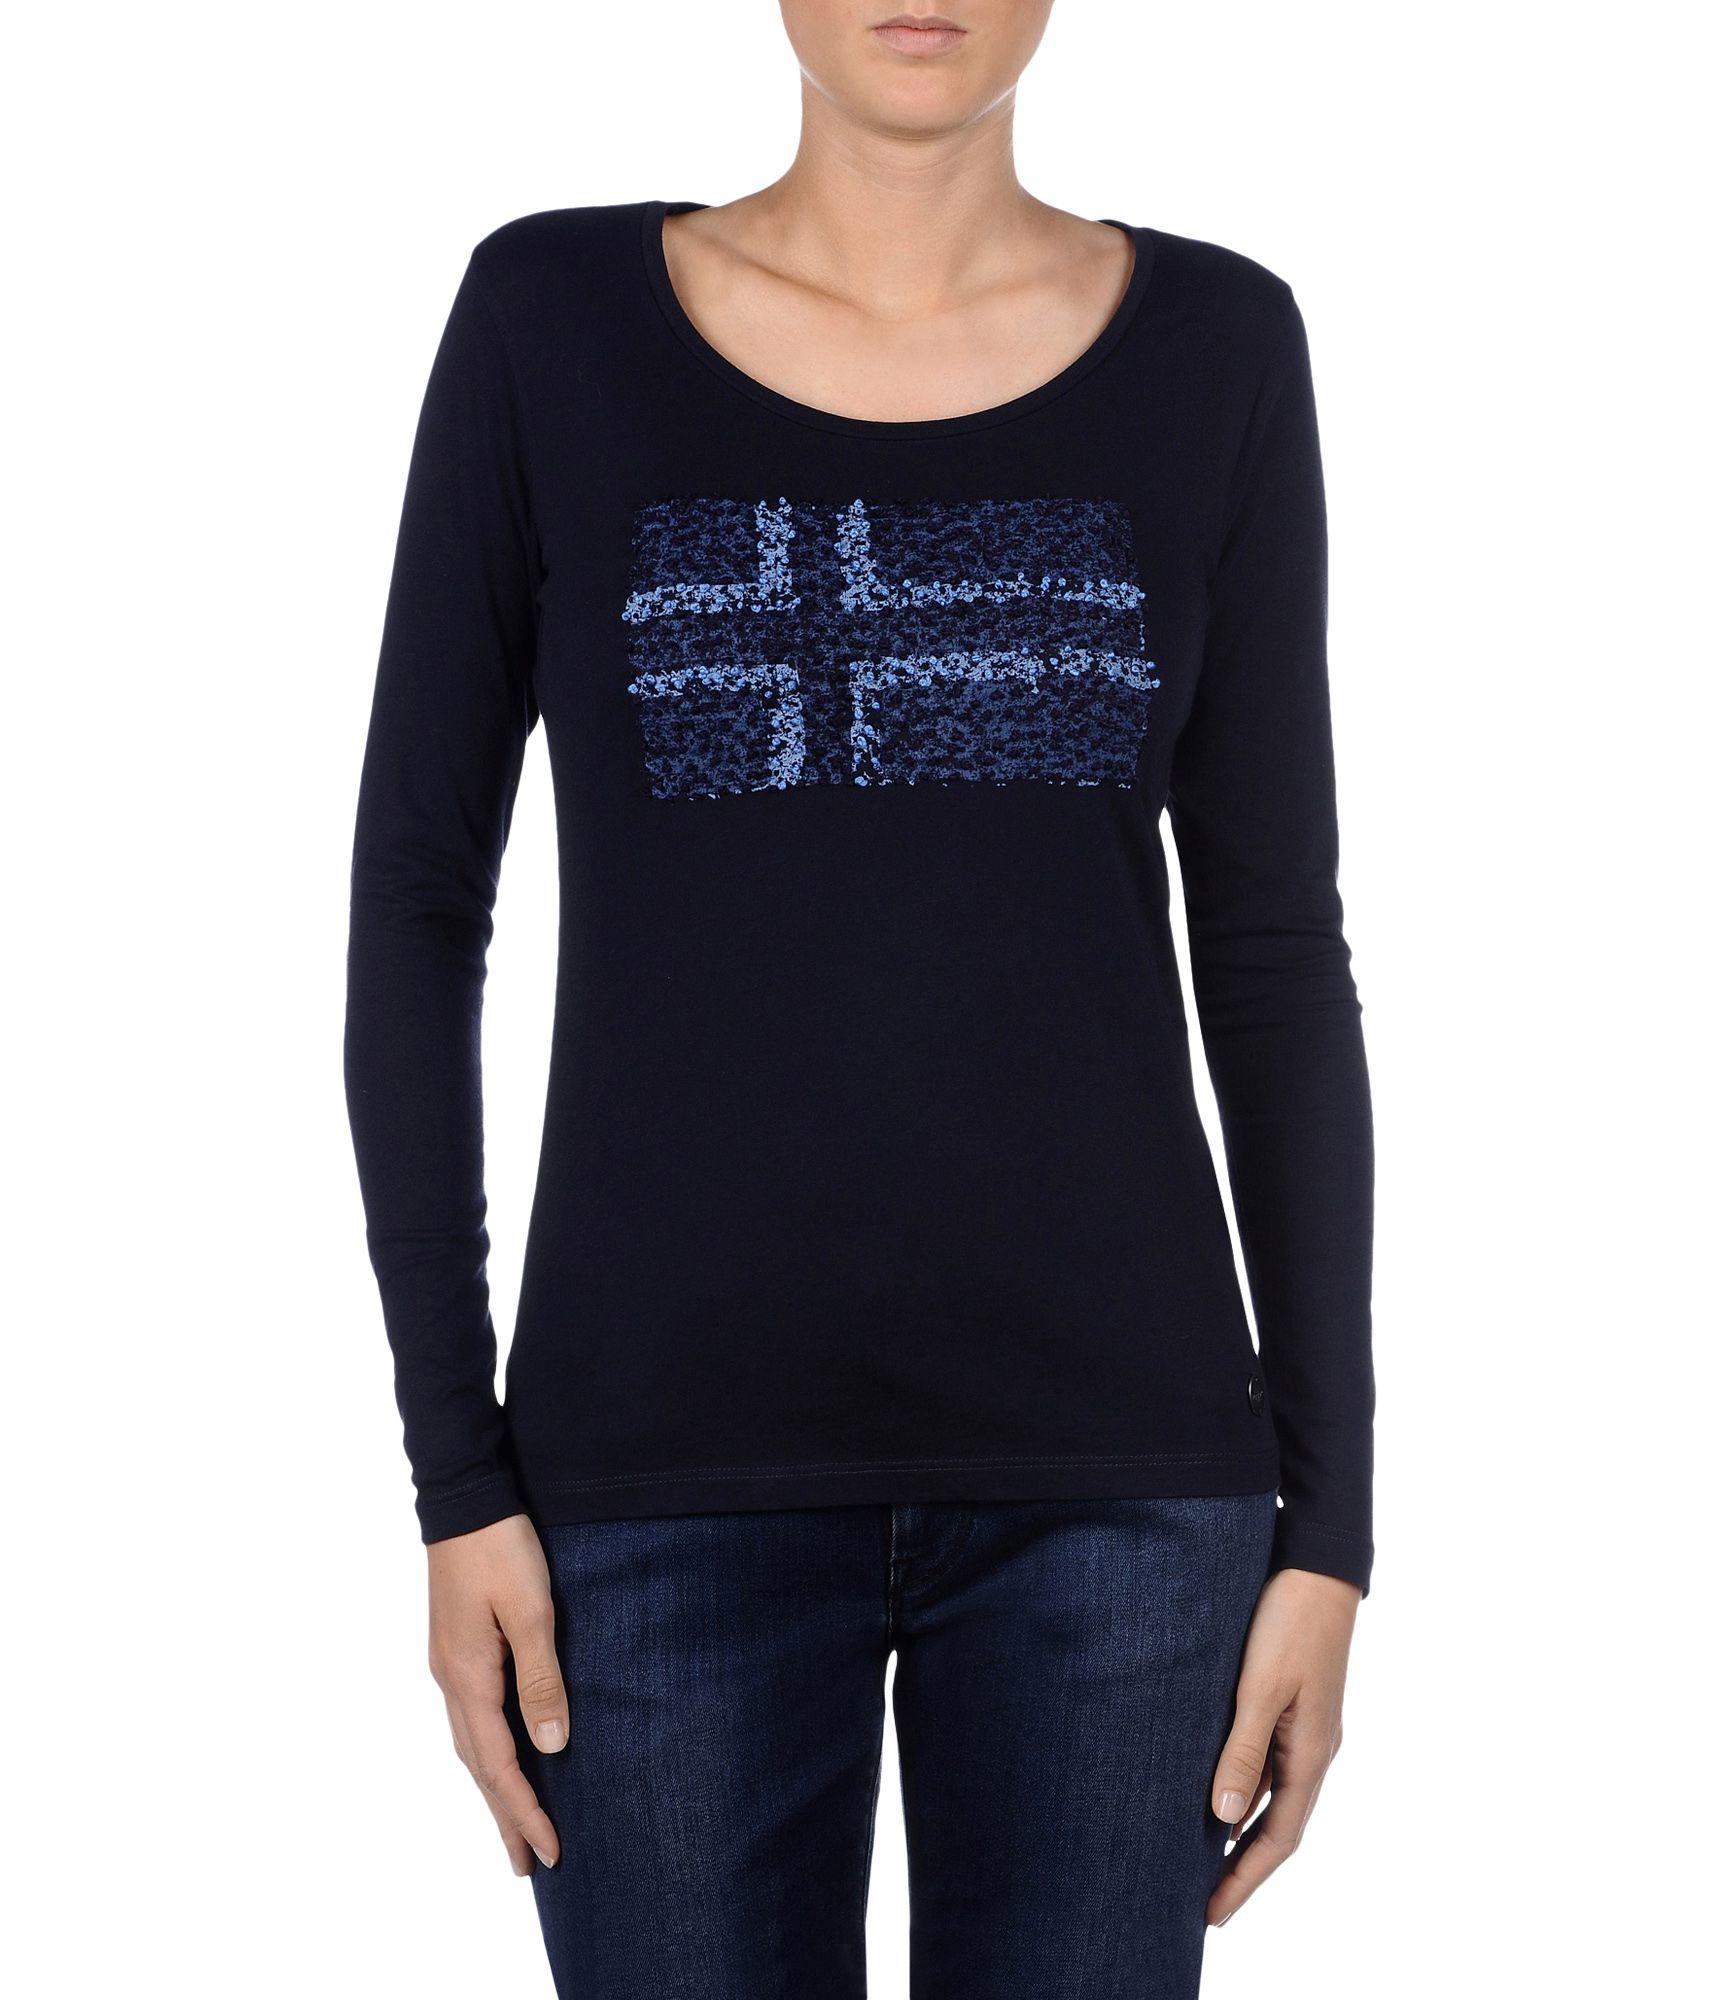 napapijri long sleeve t shirt in blue lyst. Black Bedroom Furniture Sets. Home Design Ideas